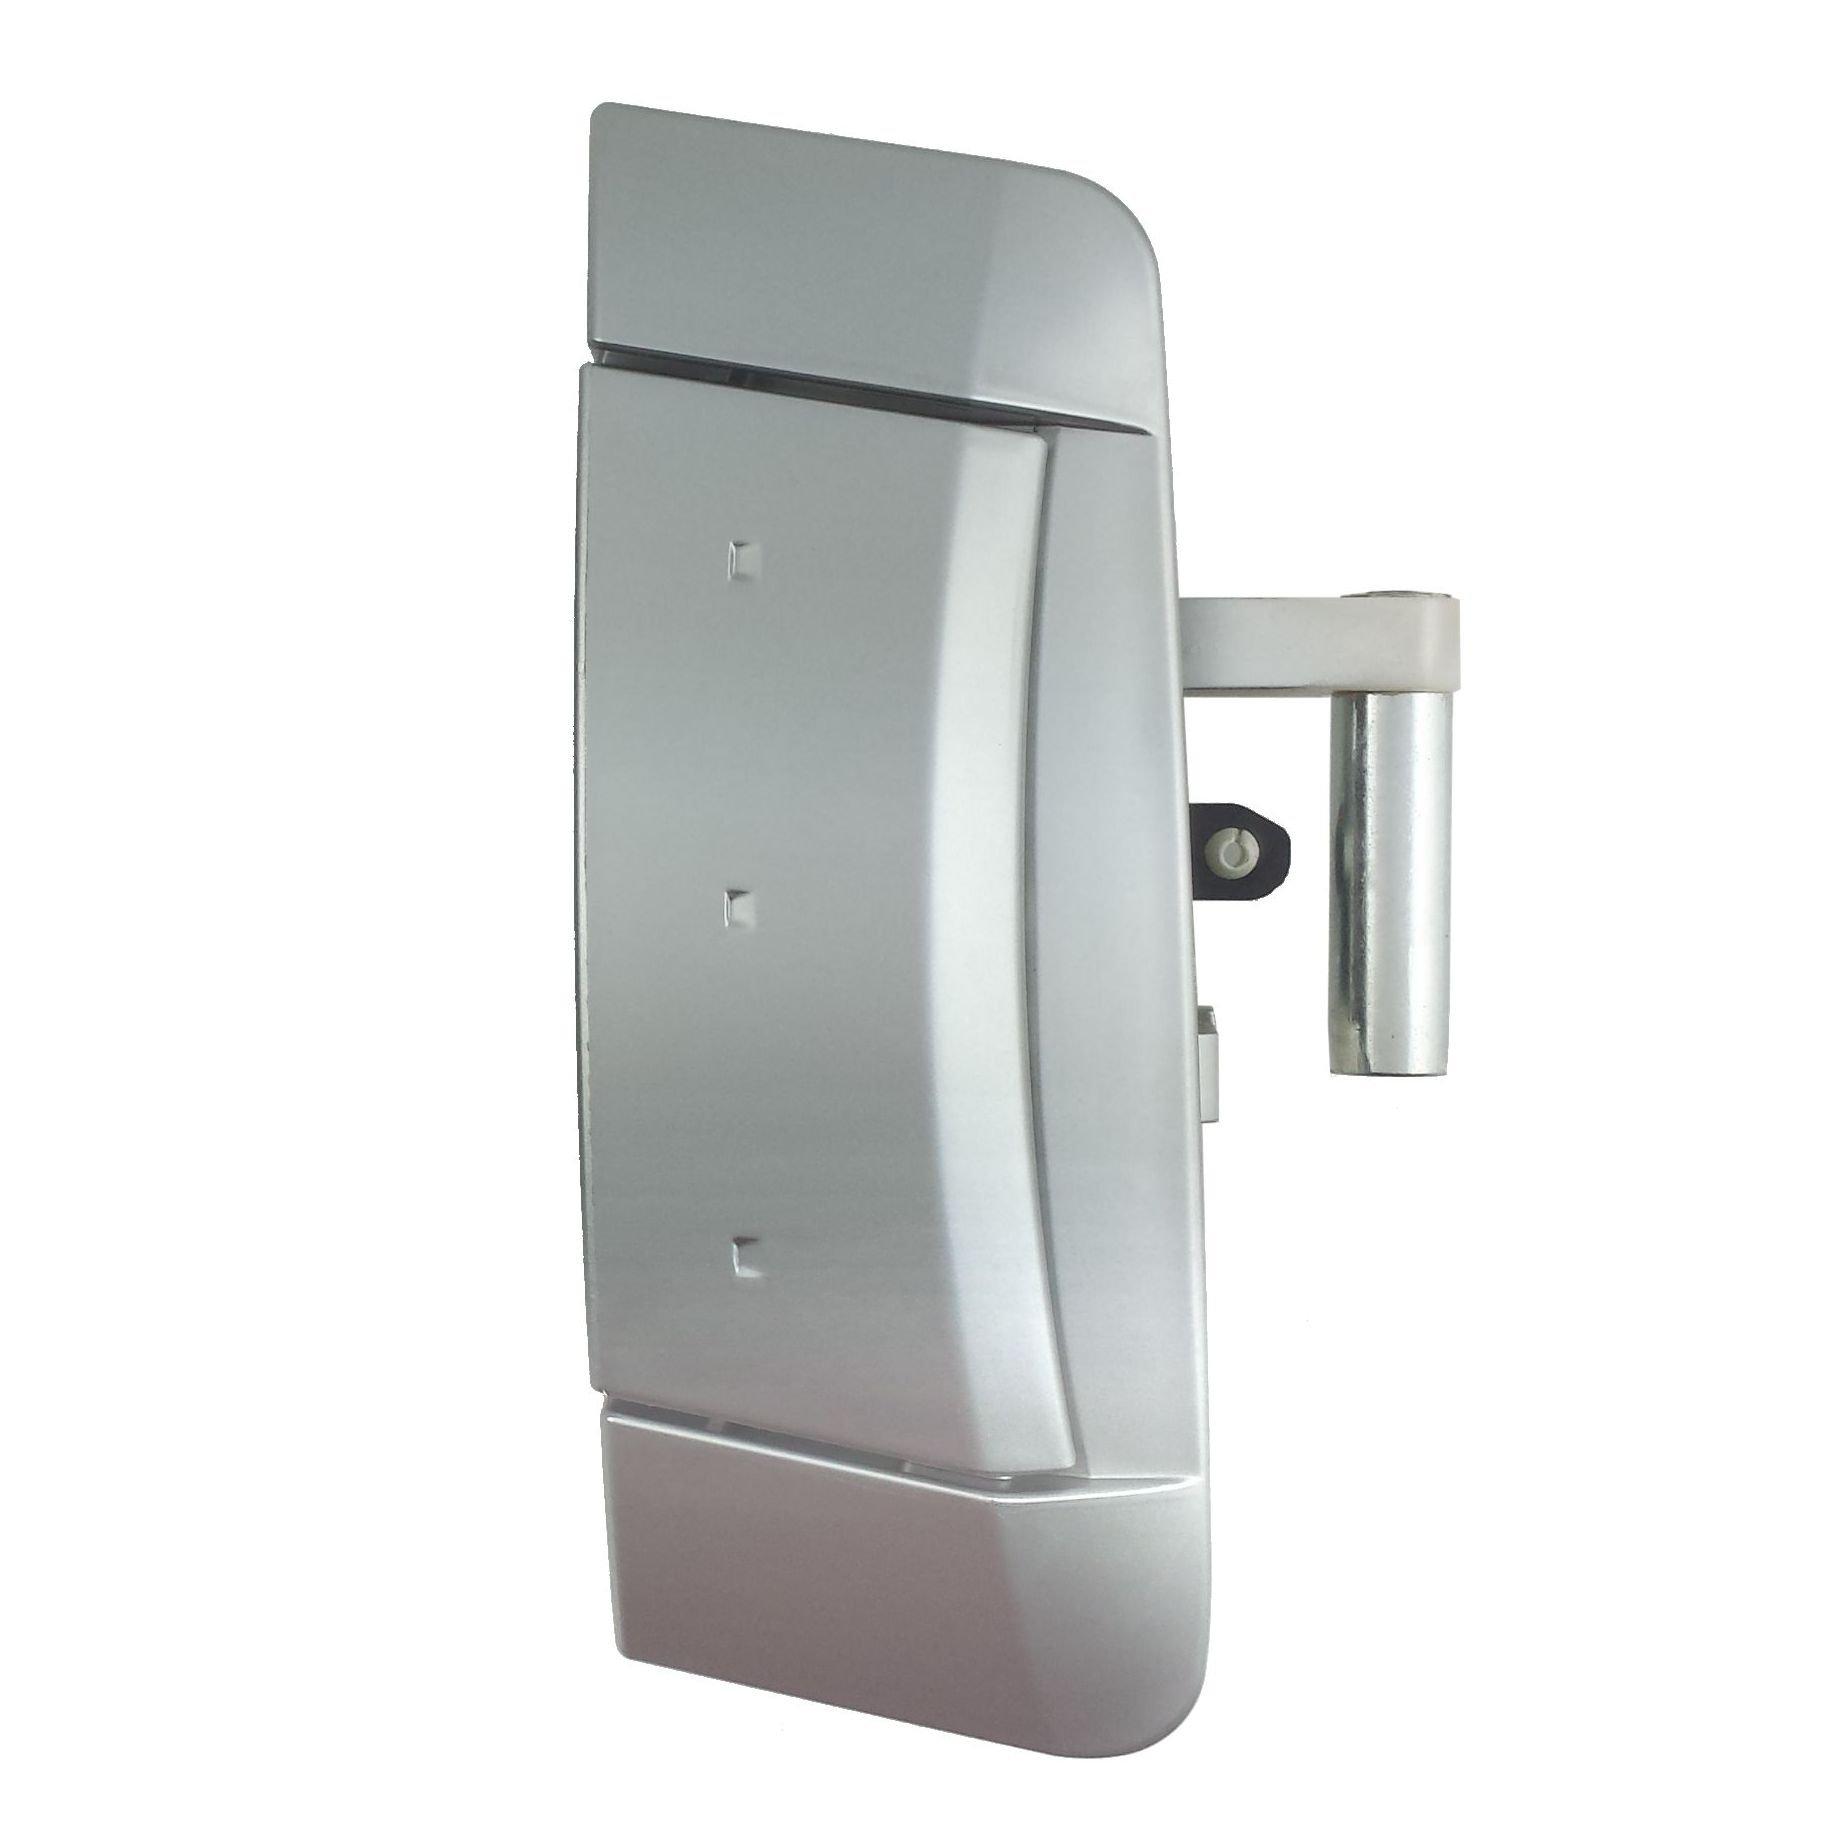 Dealer part # 28268-ZB700 BestKeys AZ-R-NIS4-350Z Key Fob In ASTU15